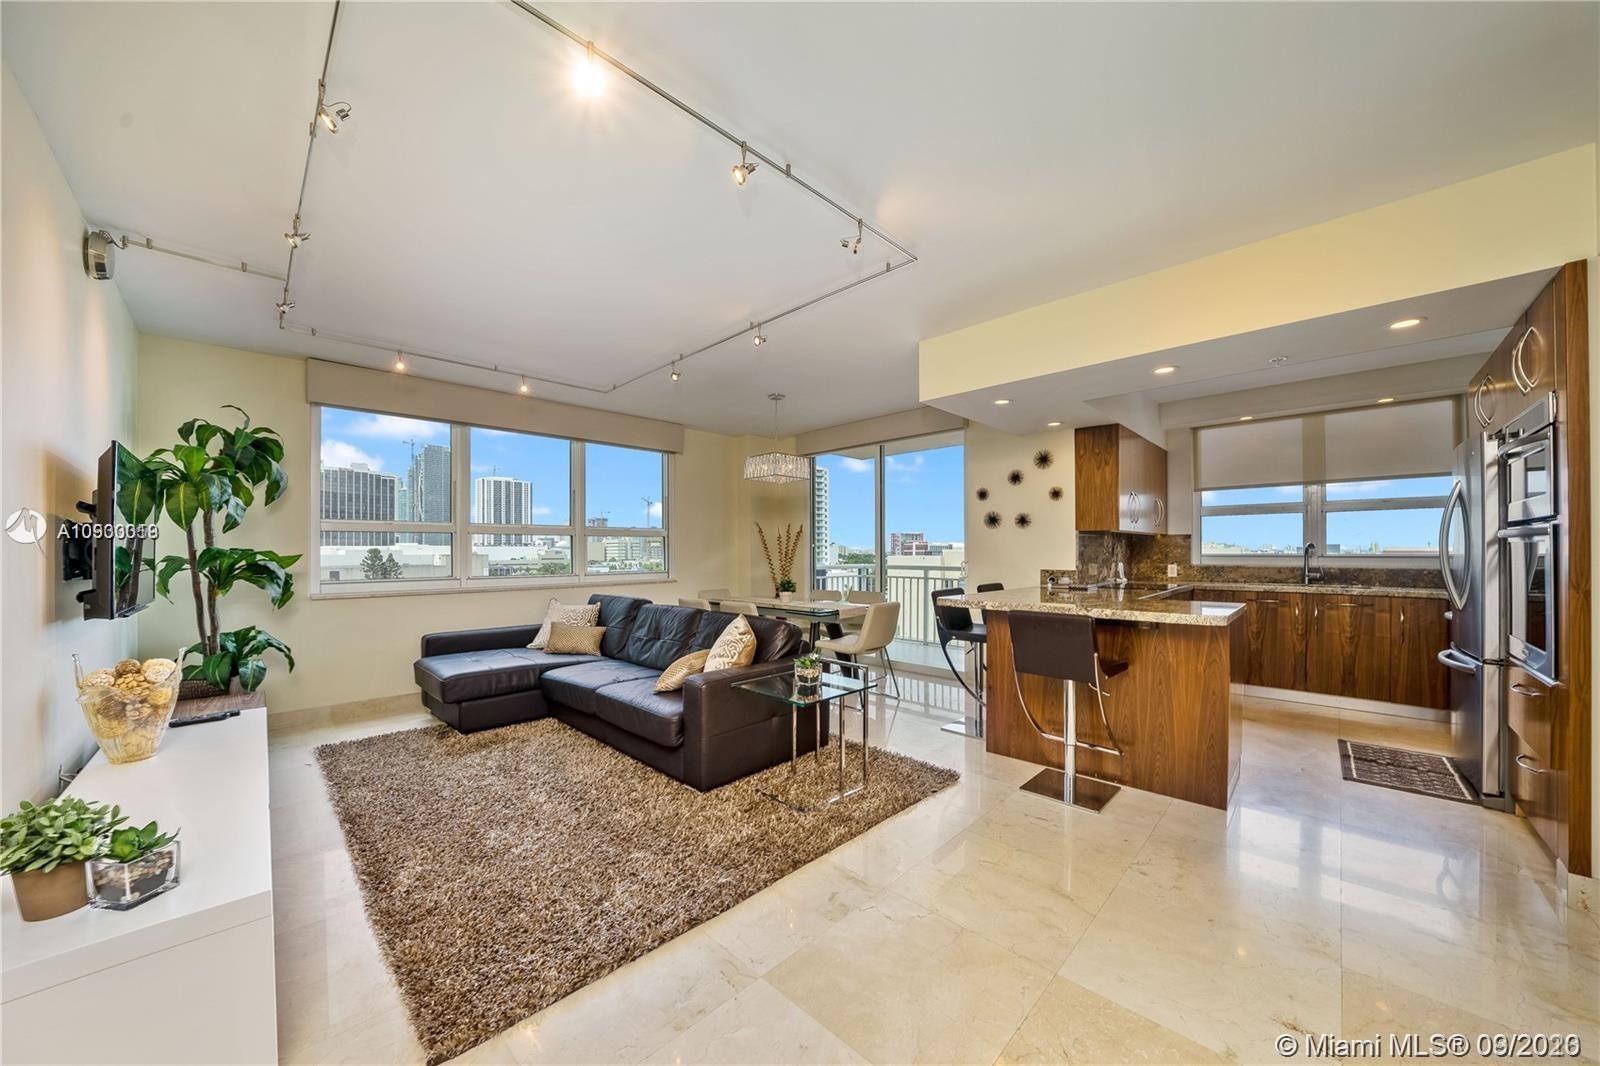 Real Estate Photo A10930019